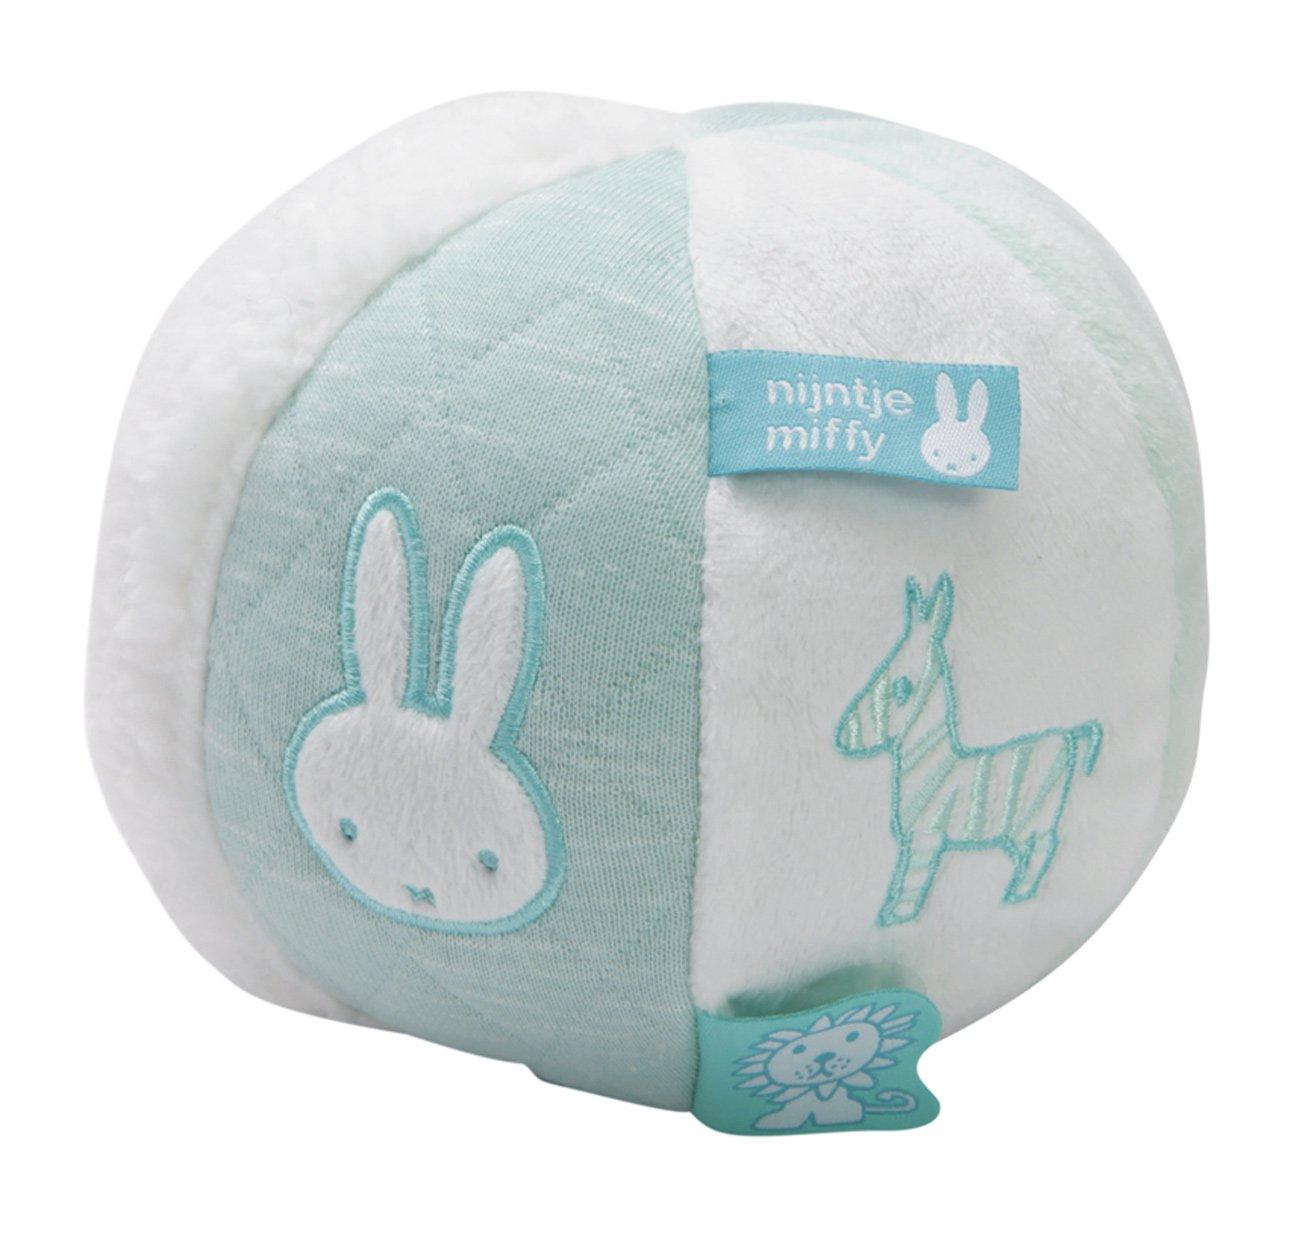 Tiamo Hase Miffy Babyball mint Ball aus Nickiplüsch mit Glöckchen